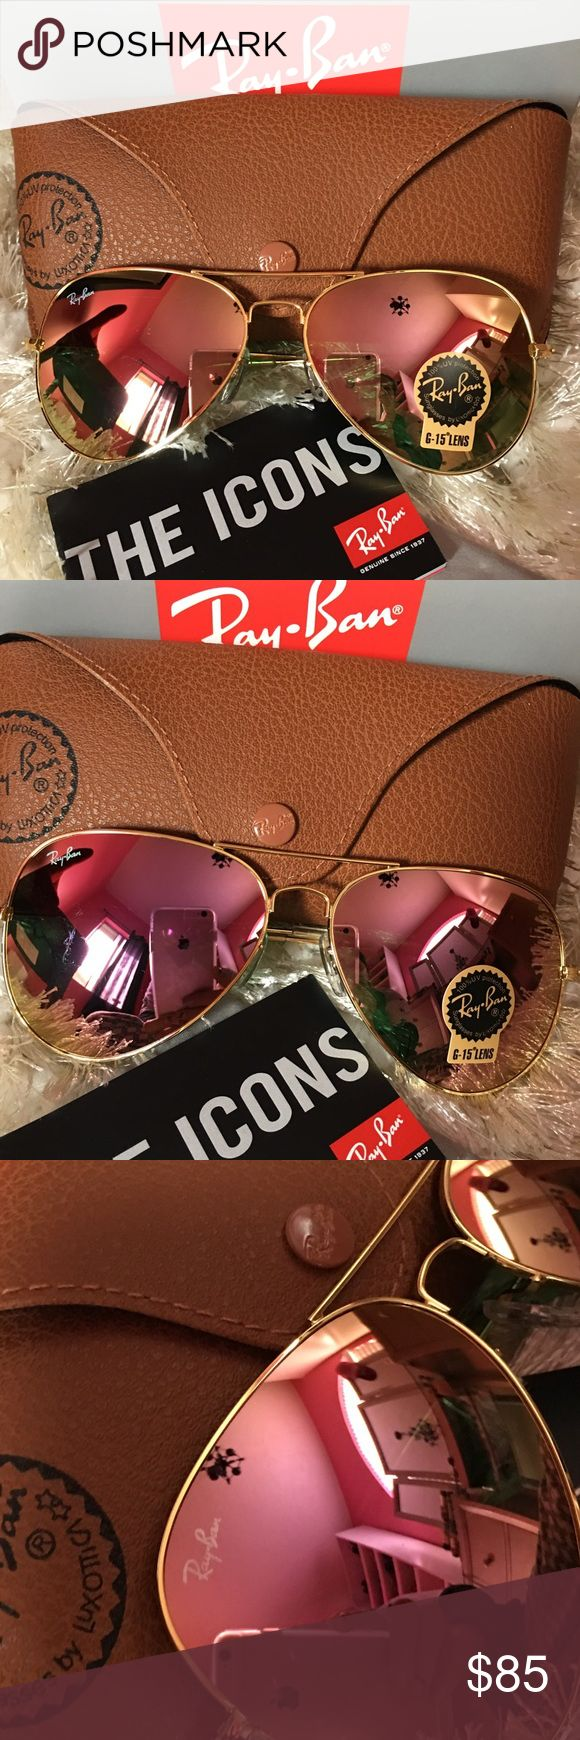 ray-ban original aviator 58mm sunglasses ray ban promo code december 2016